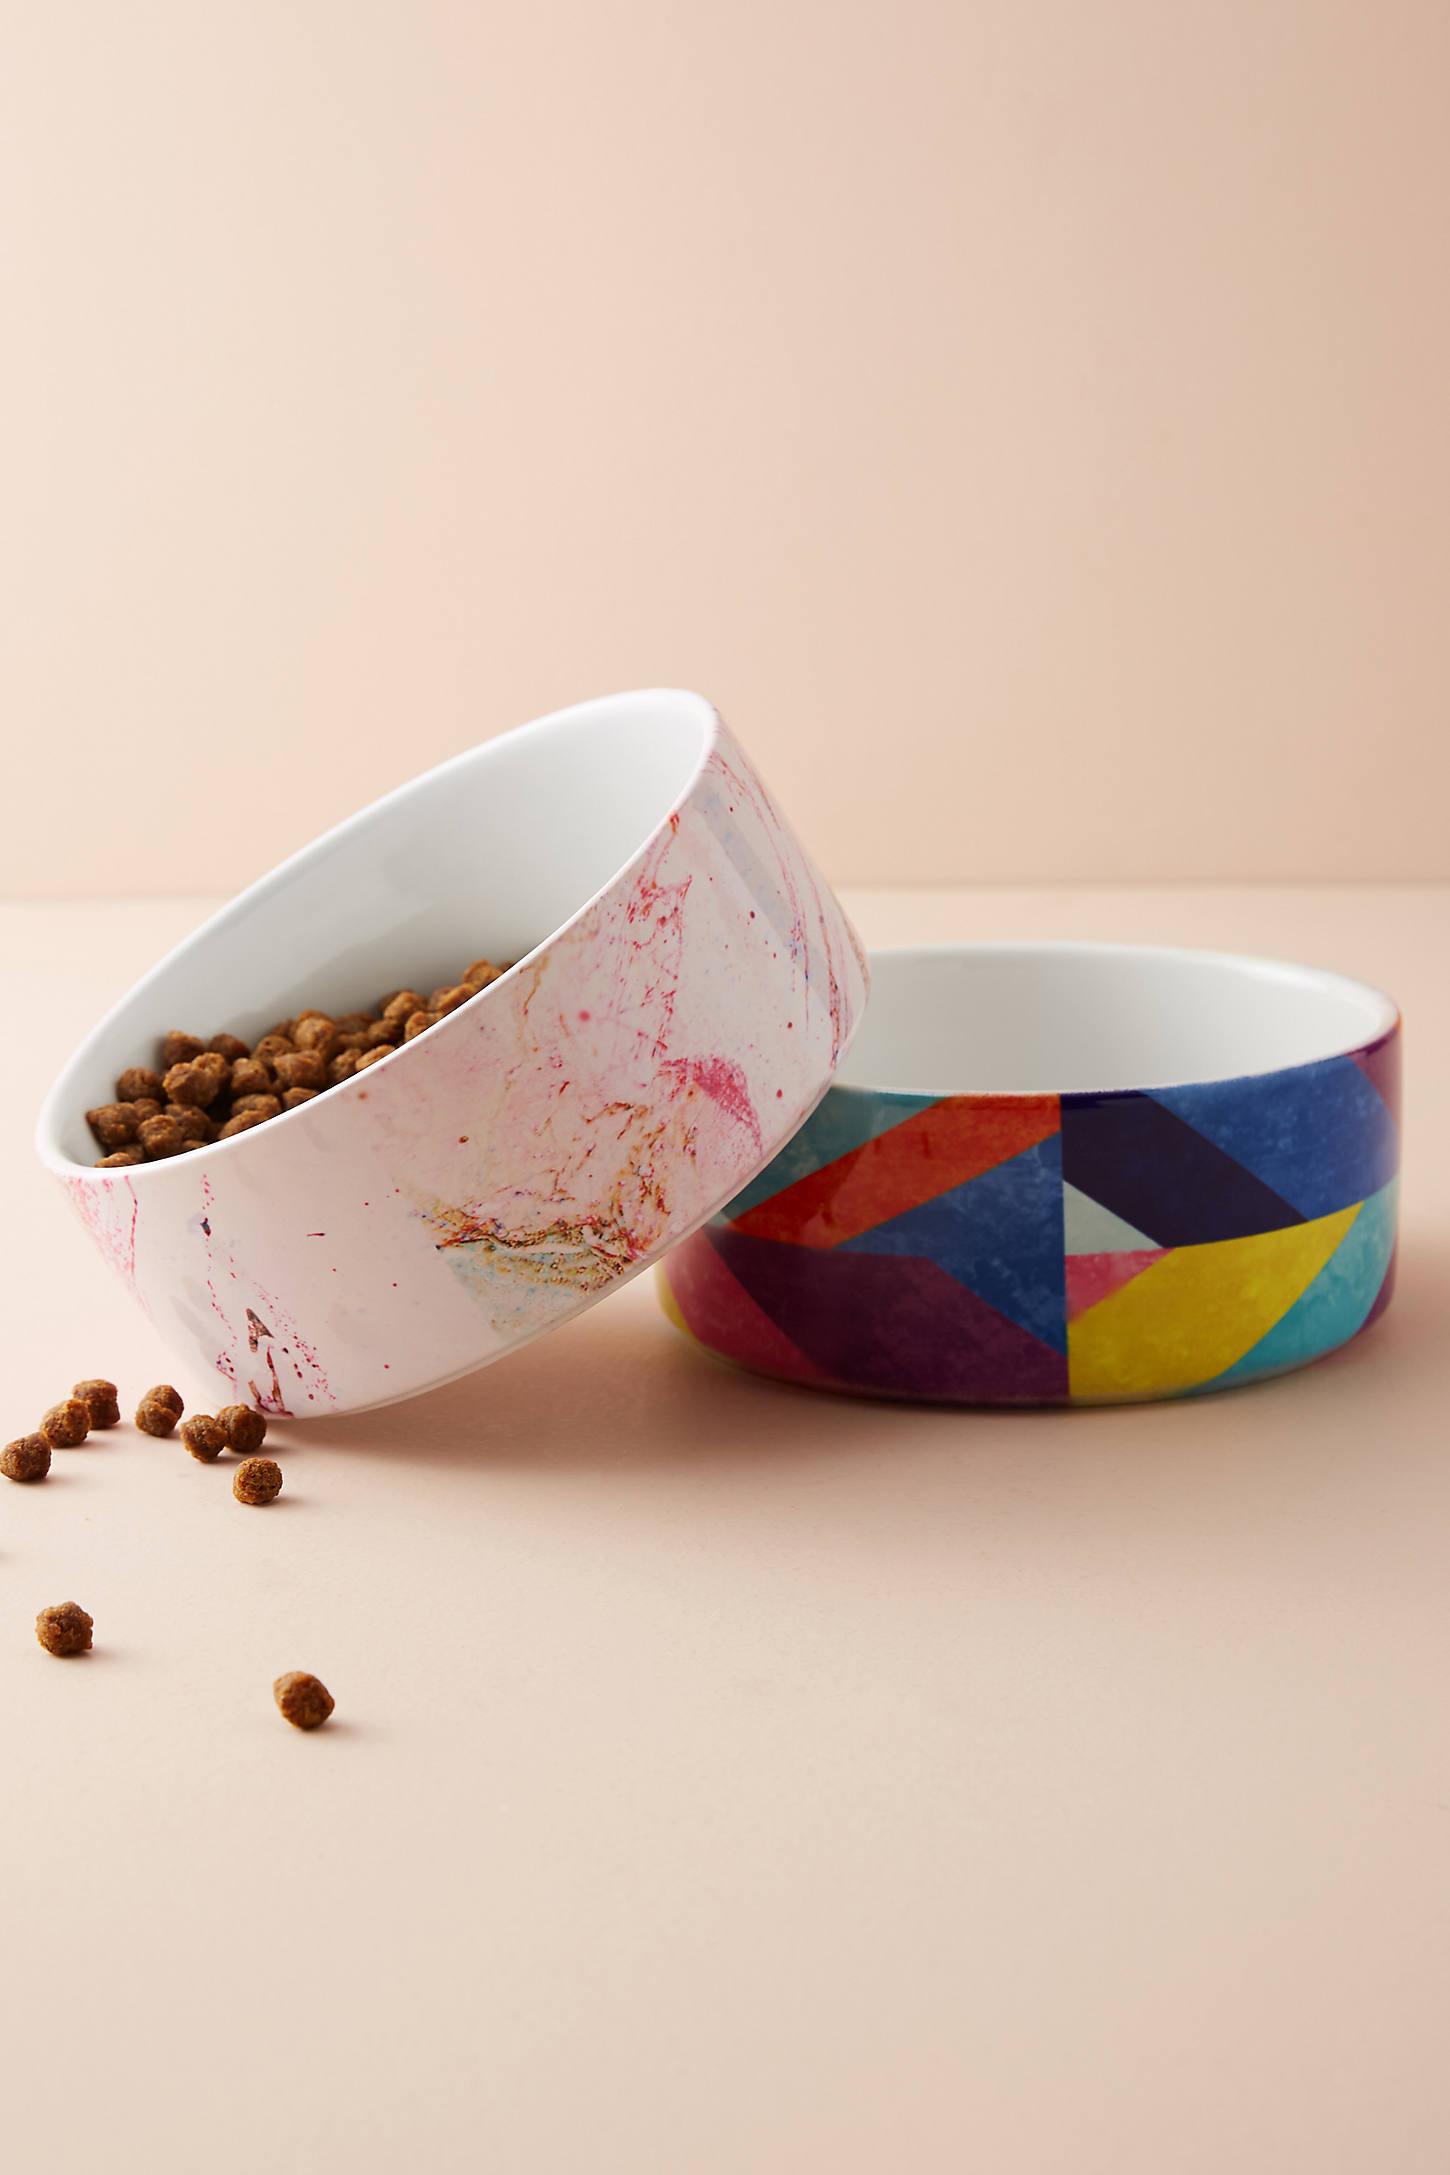 Deny Designs Dog Bowl